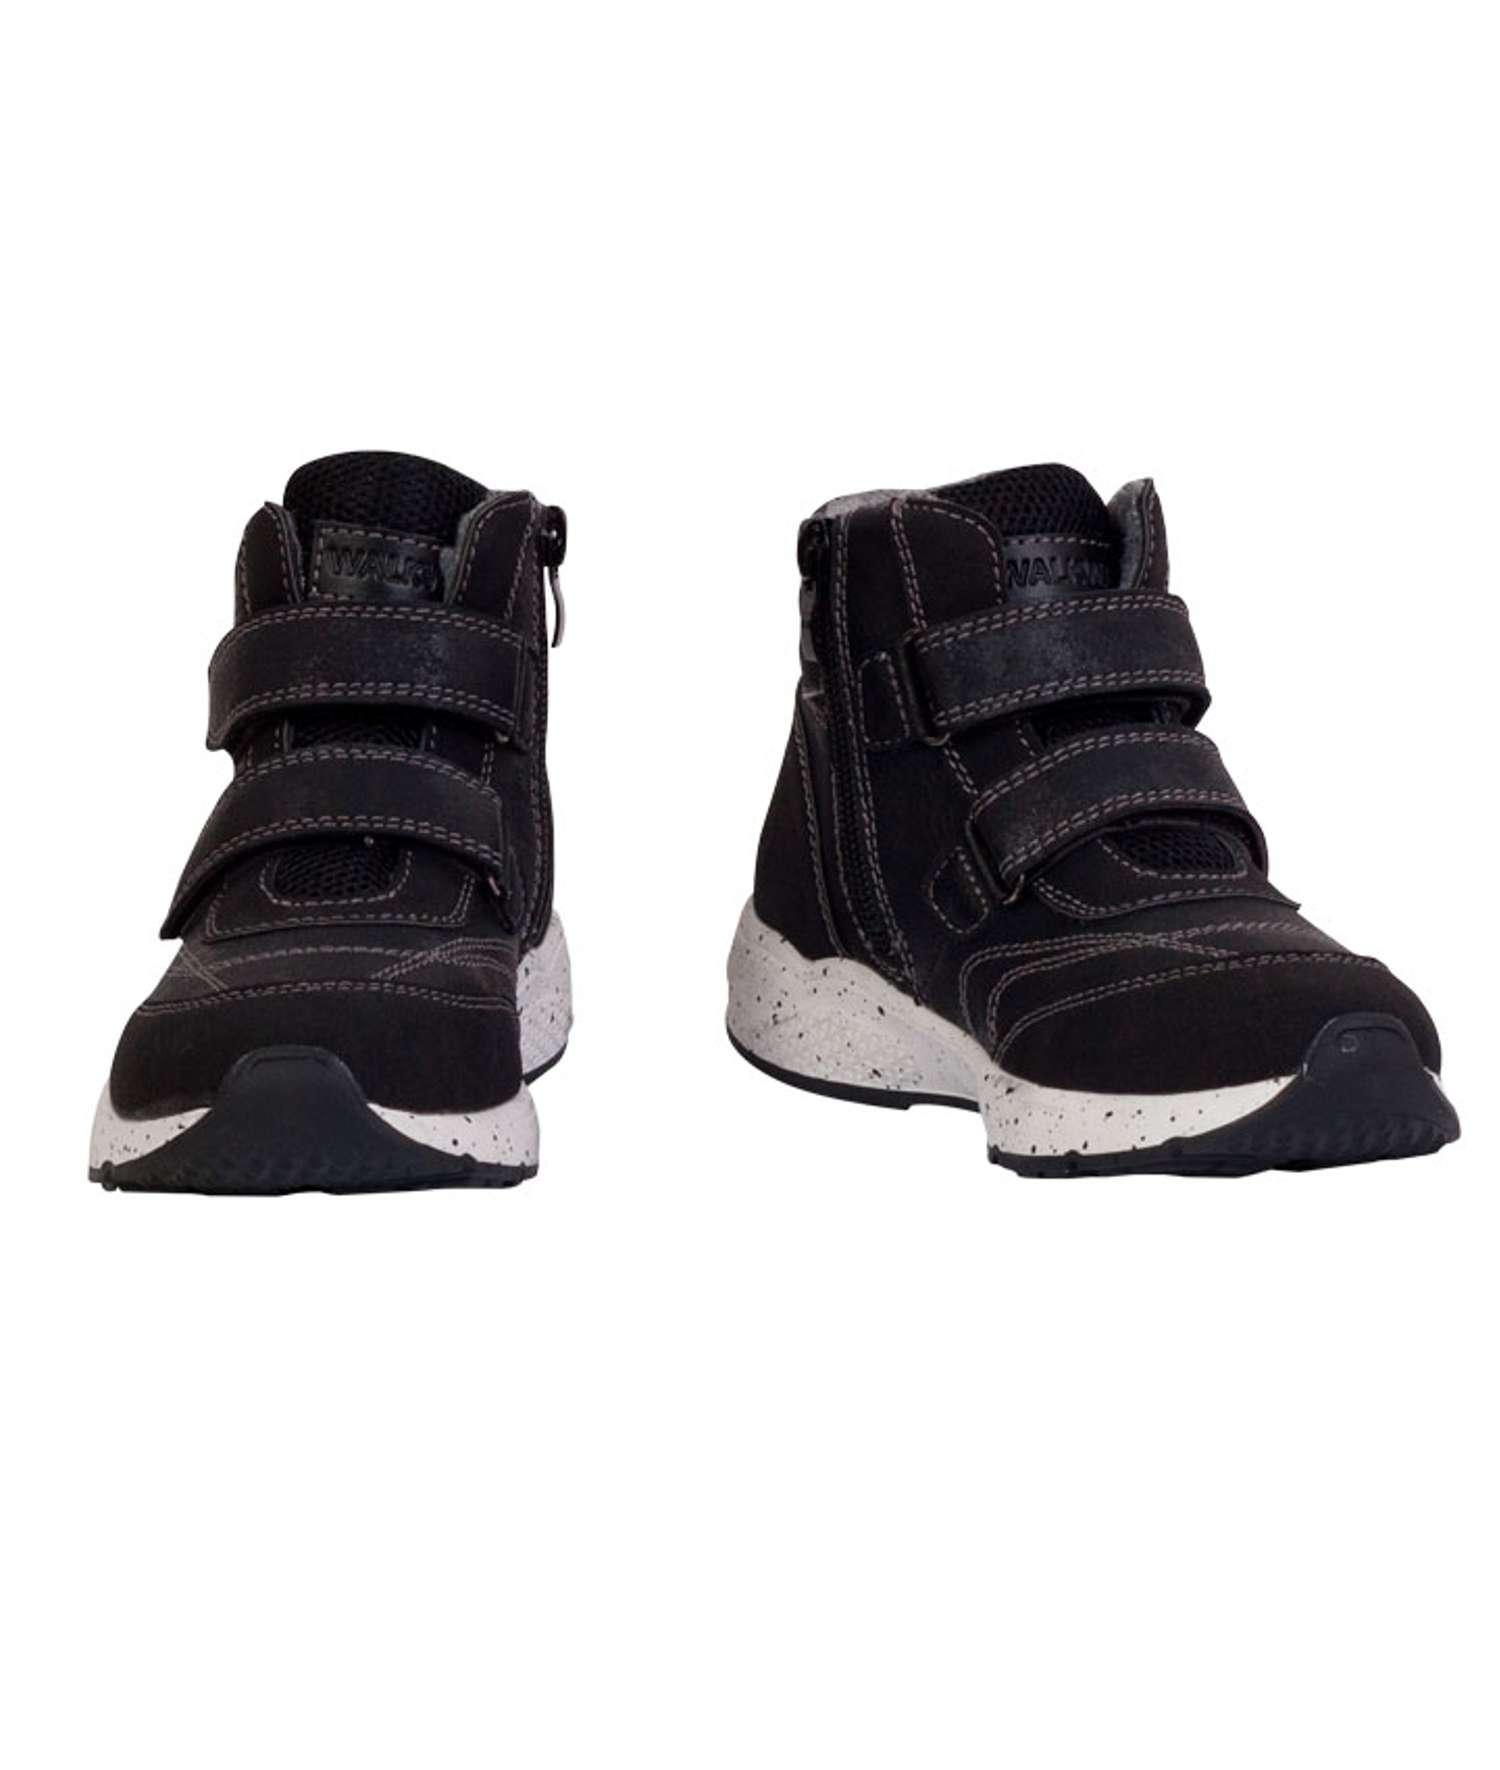 Walkway - Akako børne vinter sneakers - Sort - Størrelse 27